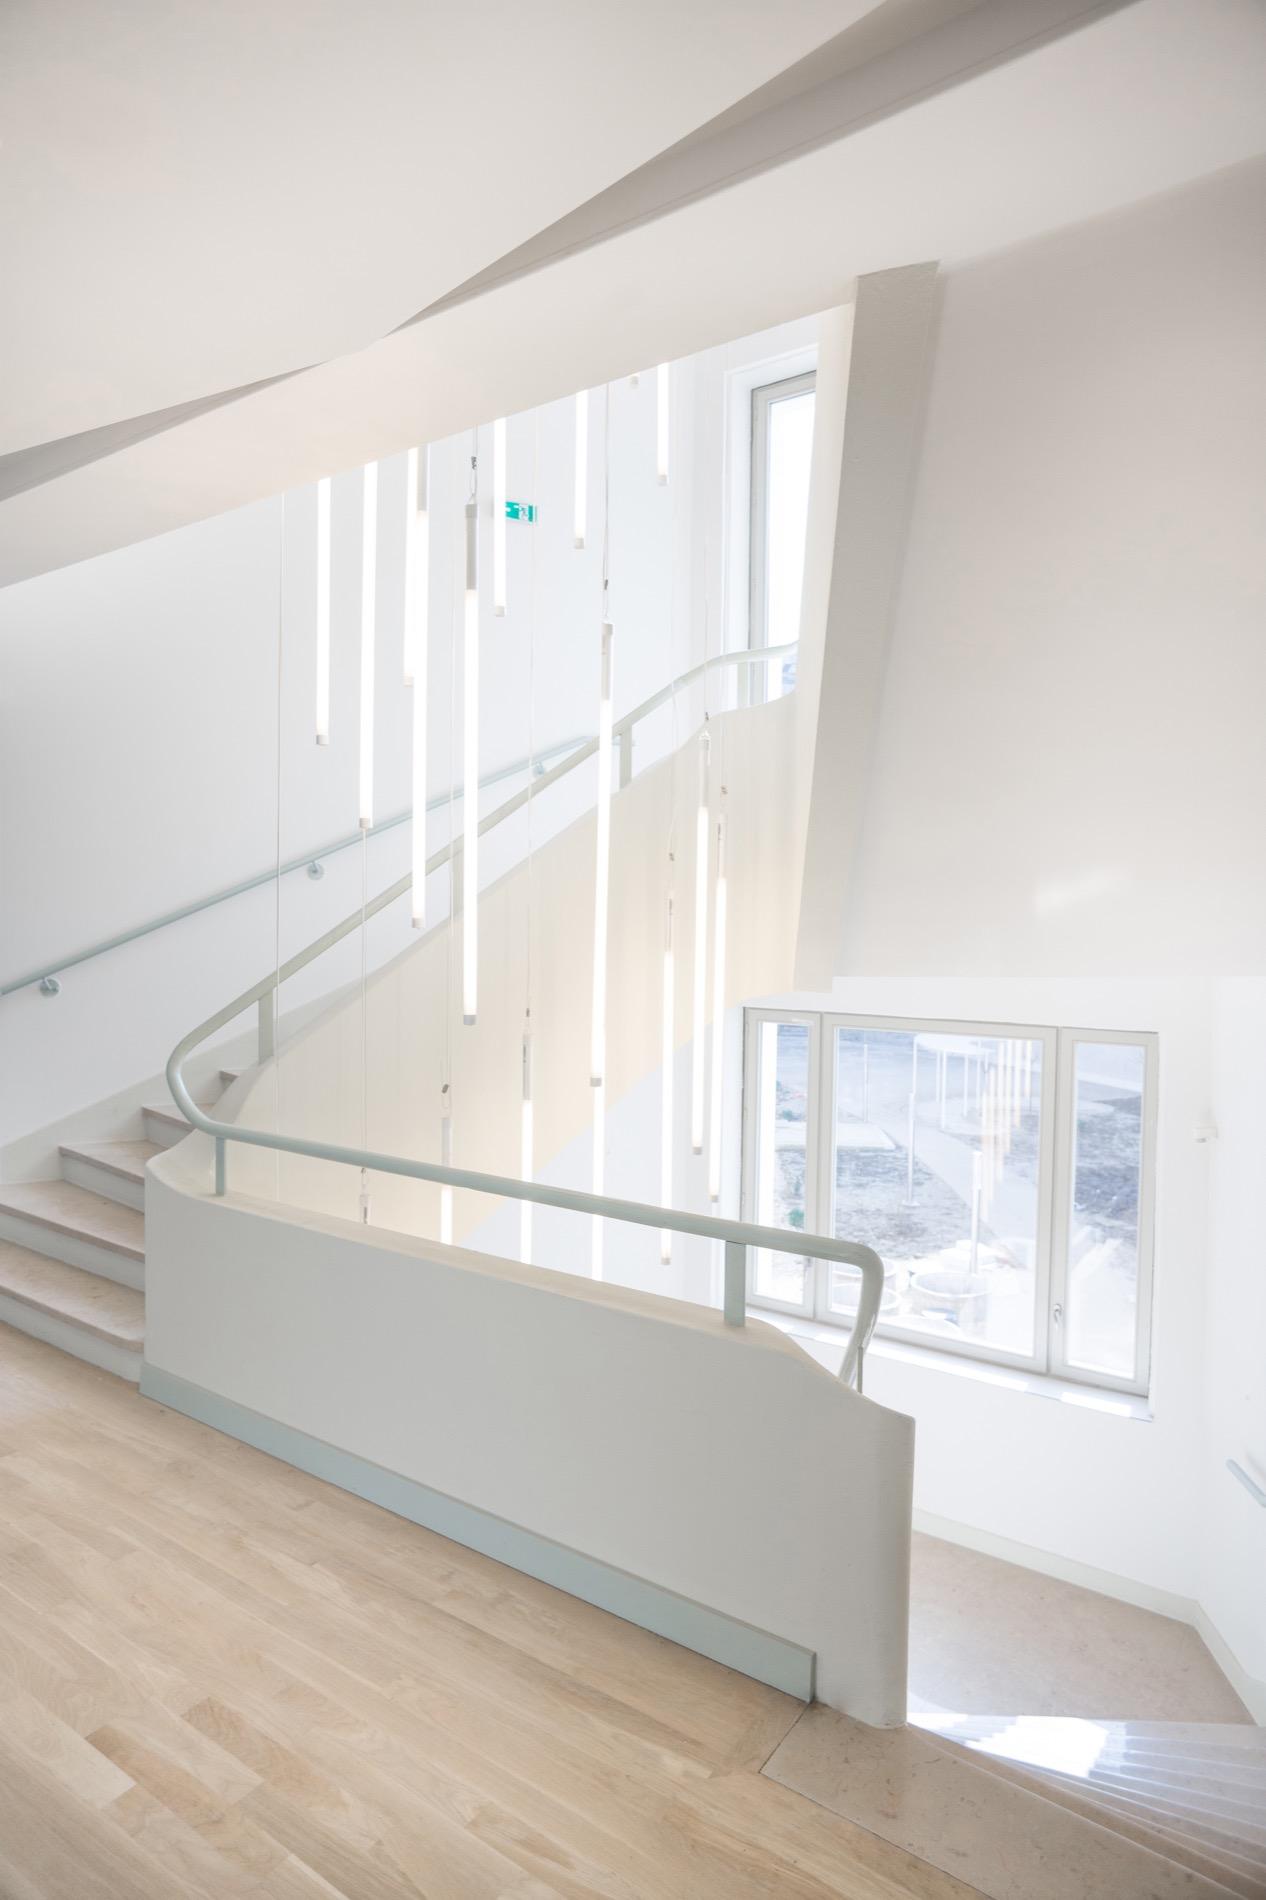 LOWENDAL_13-escalier principal